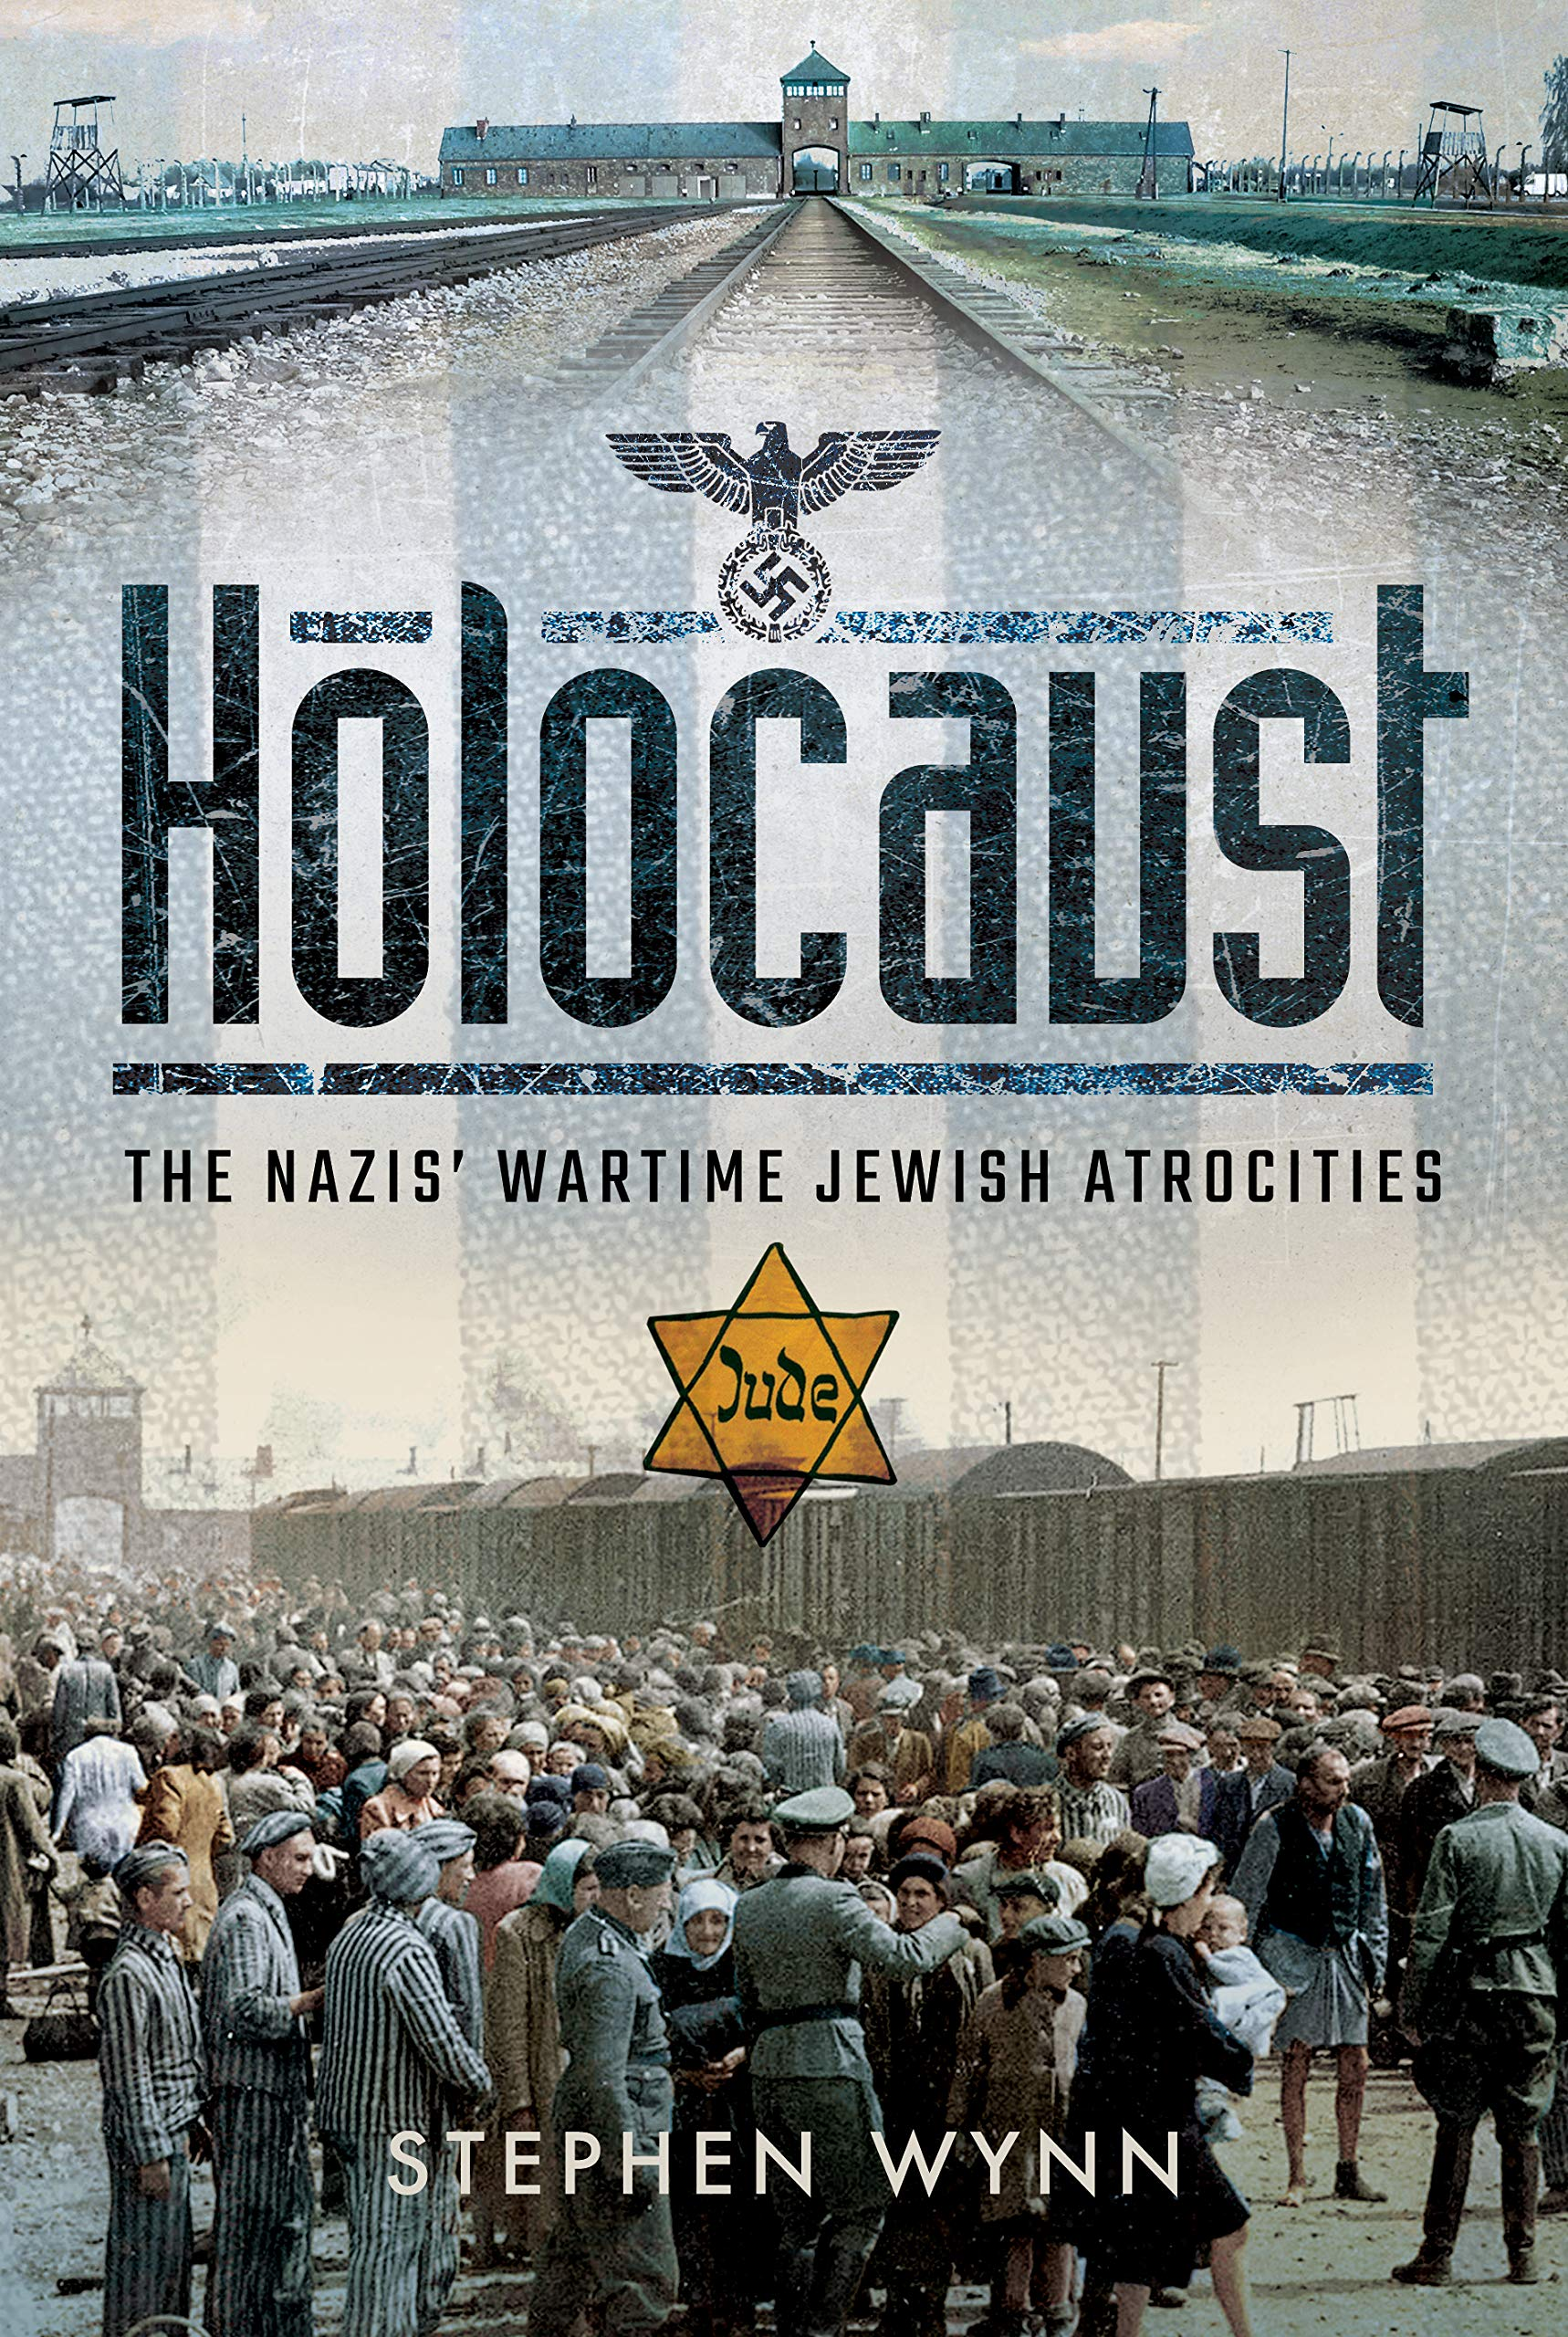 Wynn, S: Holocaust: The Nazis Wartime Jewish Atrocities: Amazon.es: Wynn, Stephen: Libros en idiomas extranjeros